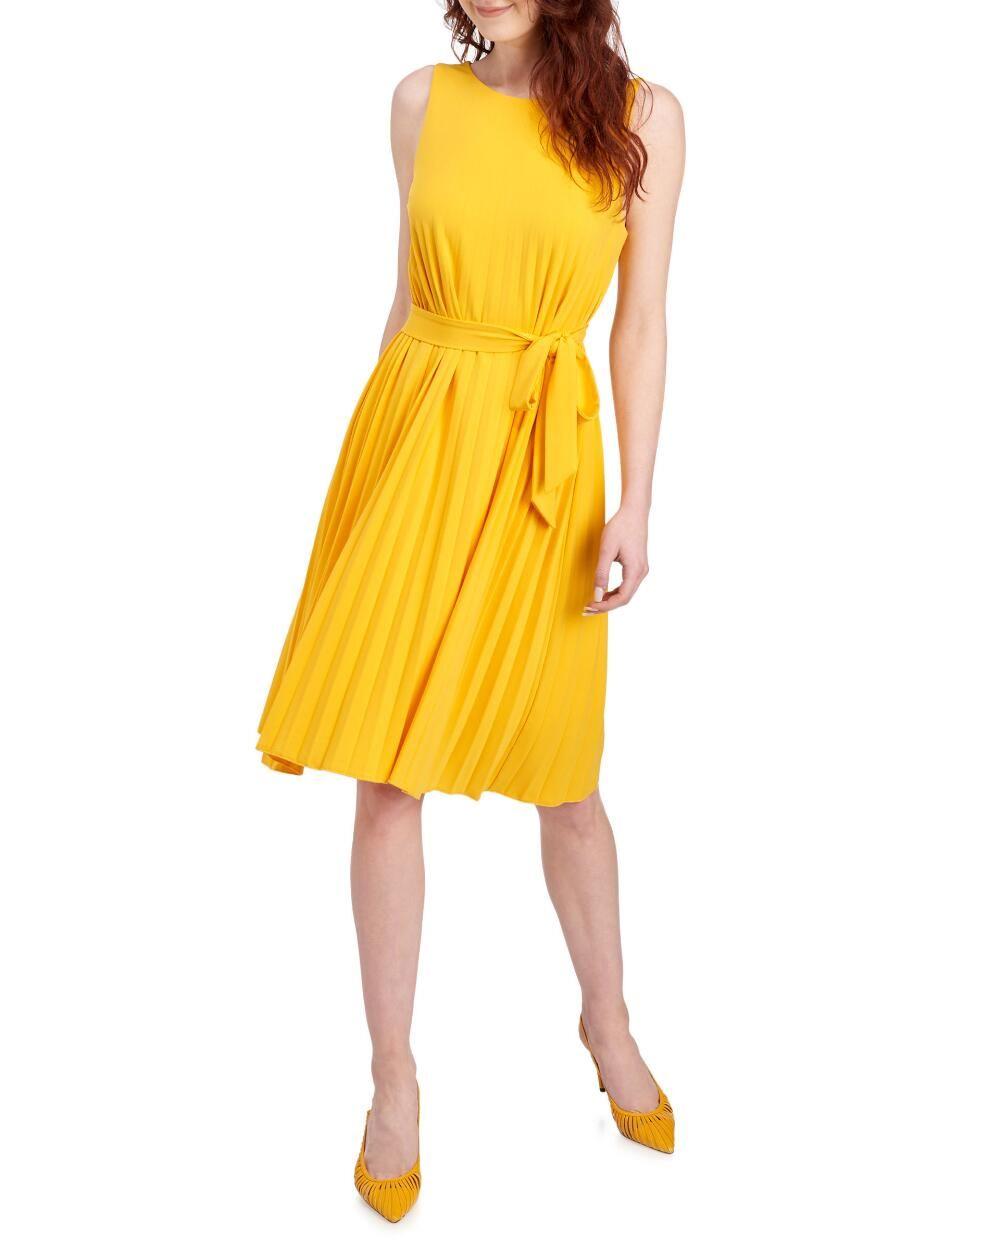 Tahari Pleated Sleeveless Dress Women Dress Online Womens Dresses Dresses [ 1250 x 1000 Pixel ]